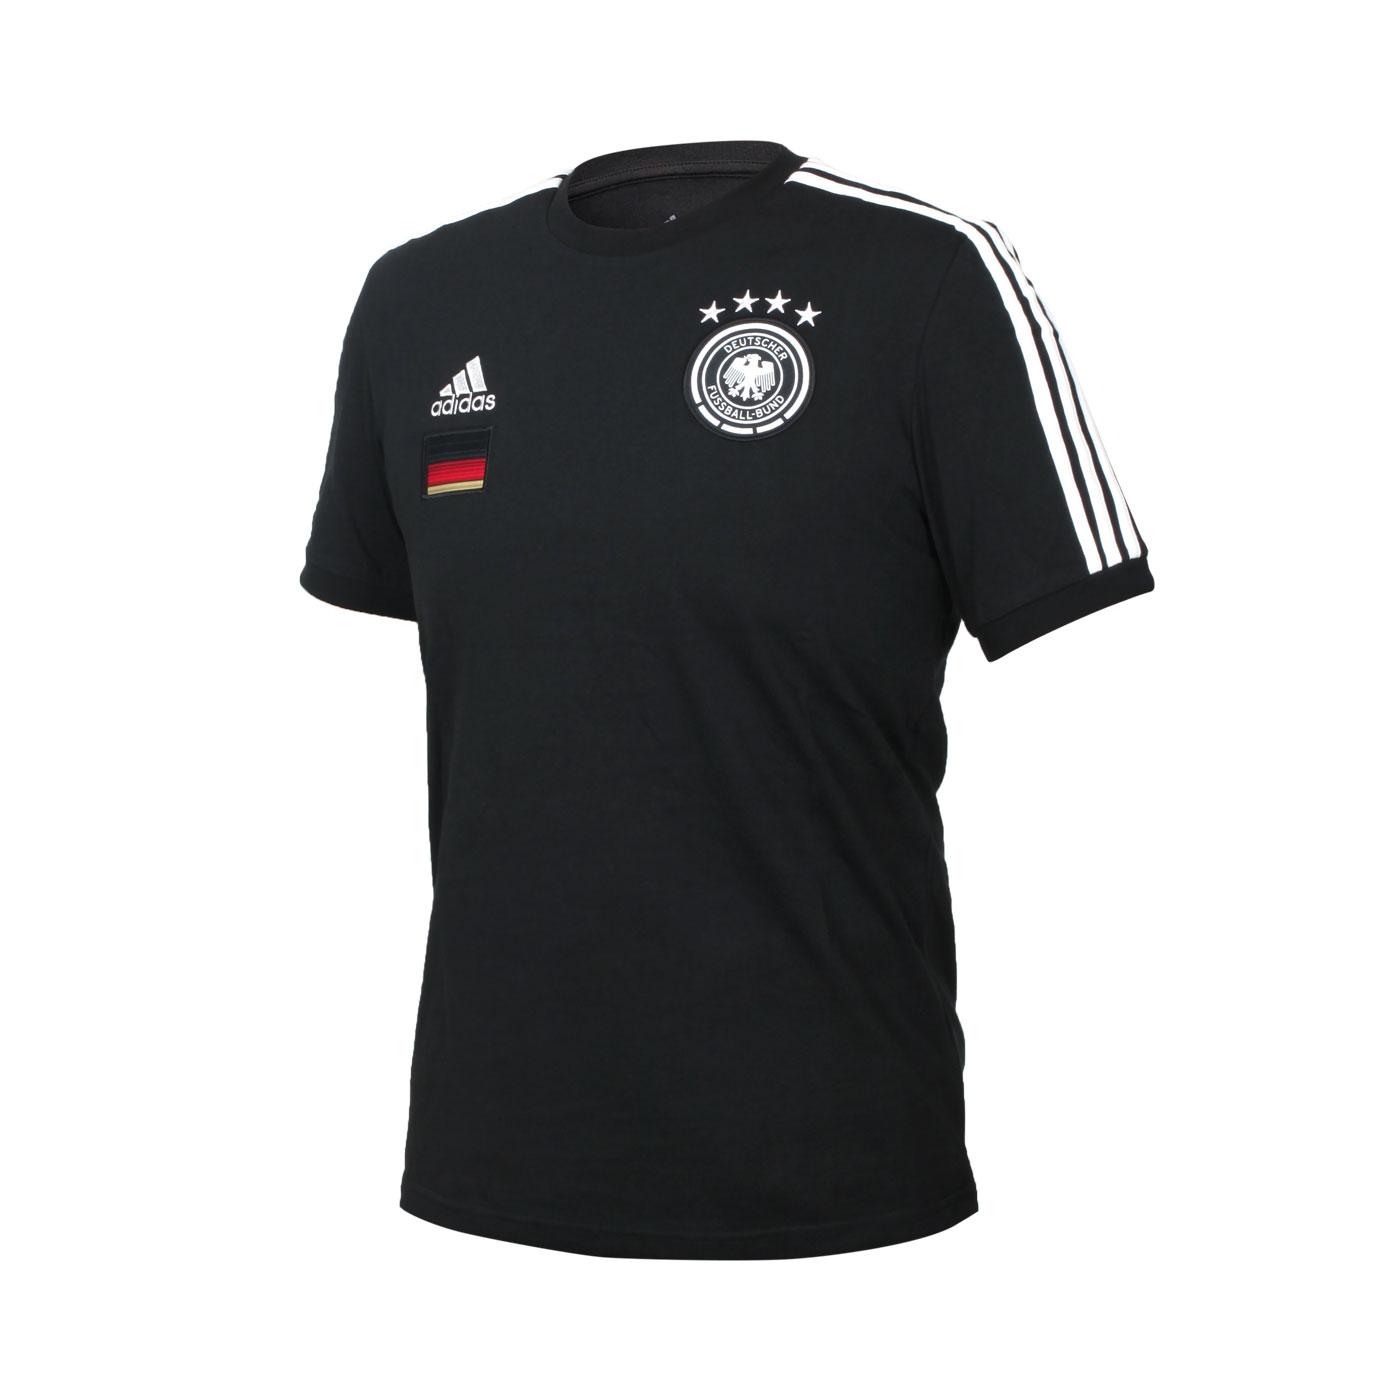 ADIDAS 男款足球短袖T恤 FI1461 - 黑白